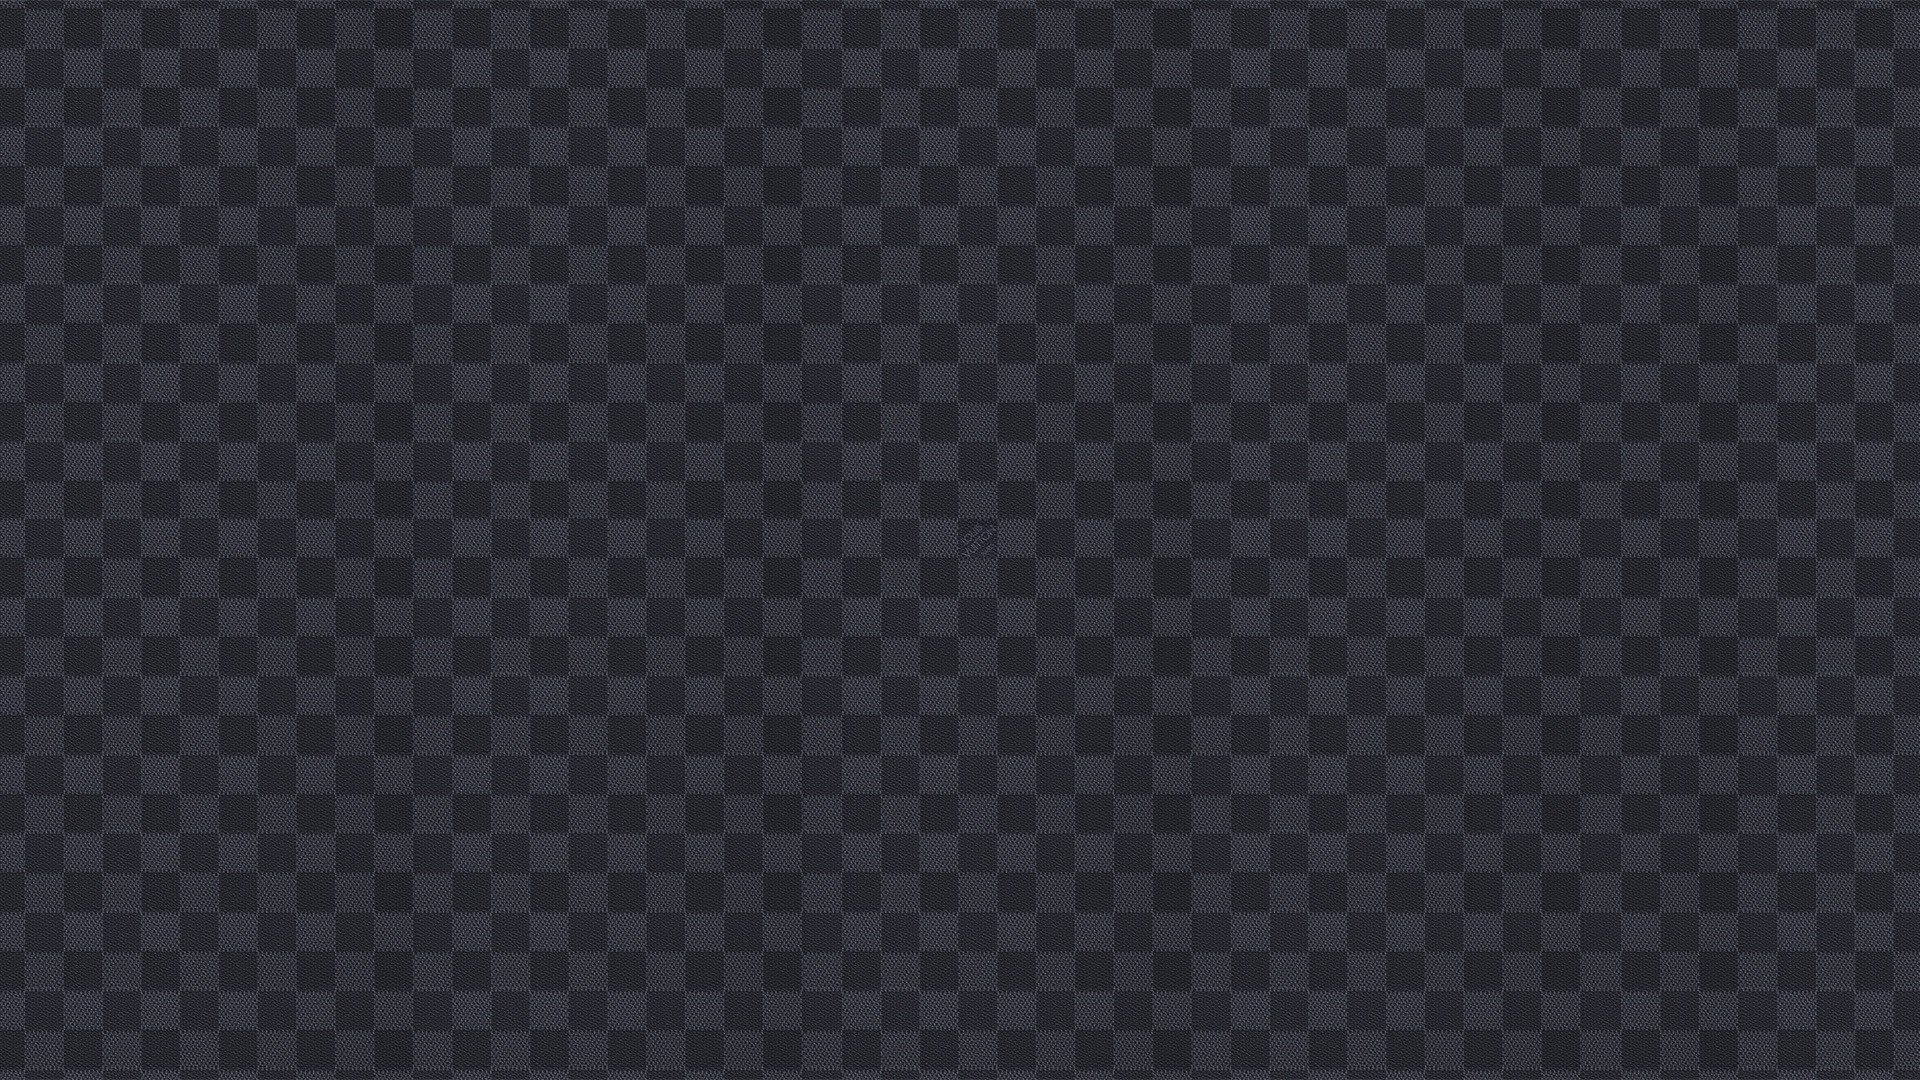 10 Louis Vuitton HD Wallpapers